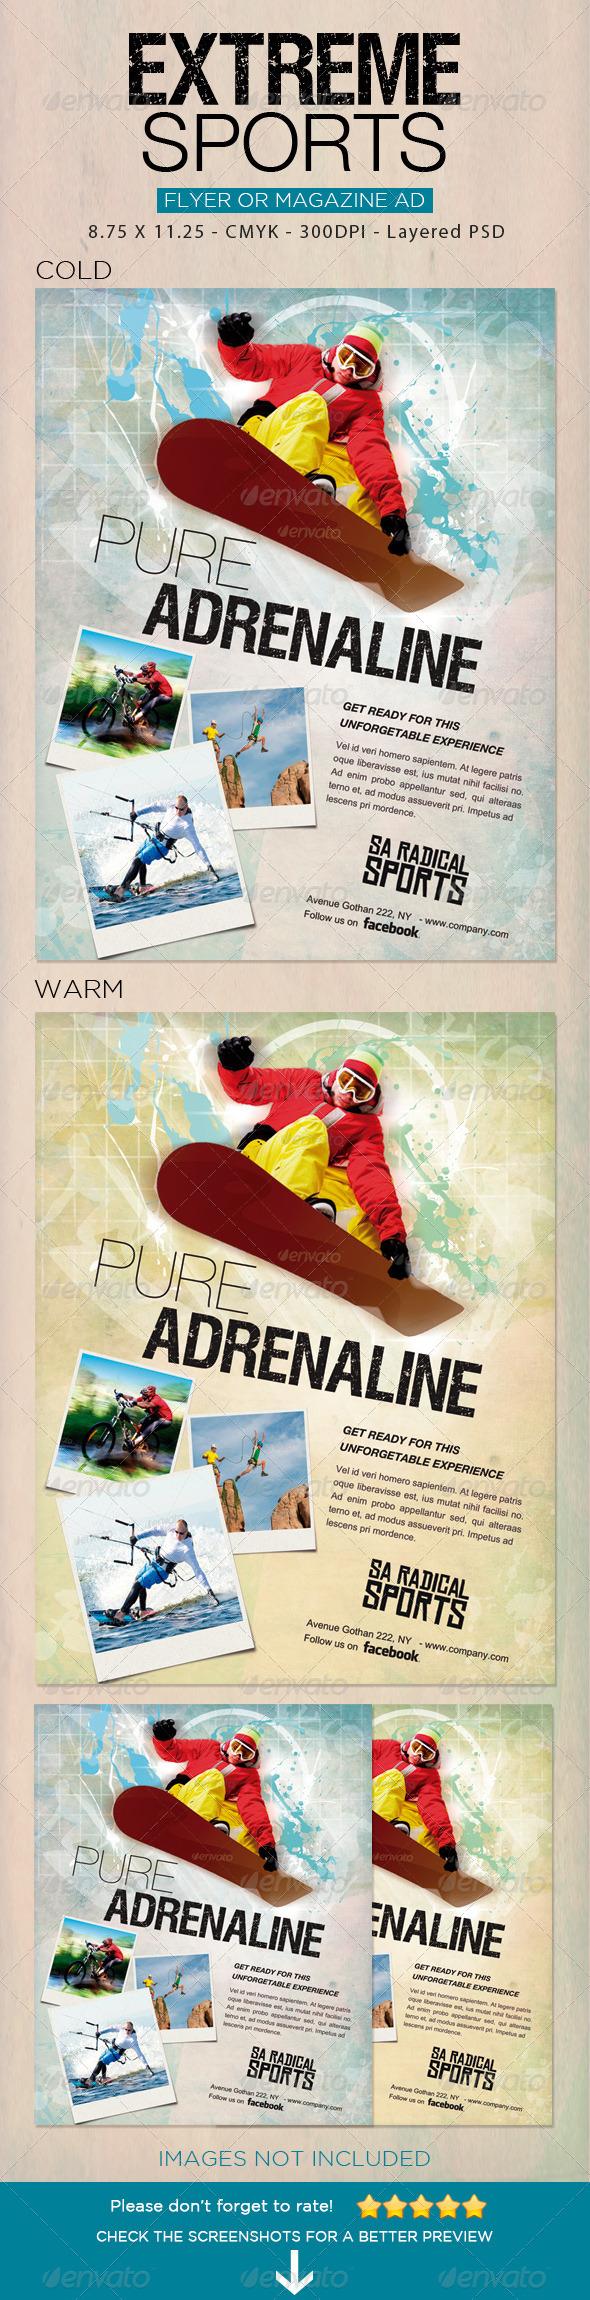 Extreme Sports flyer 2